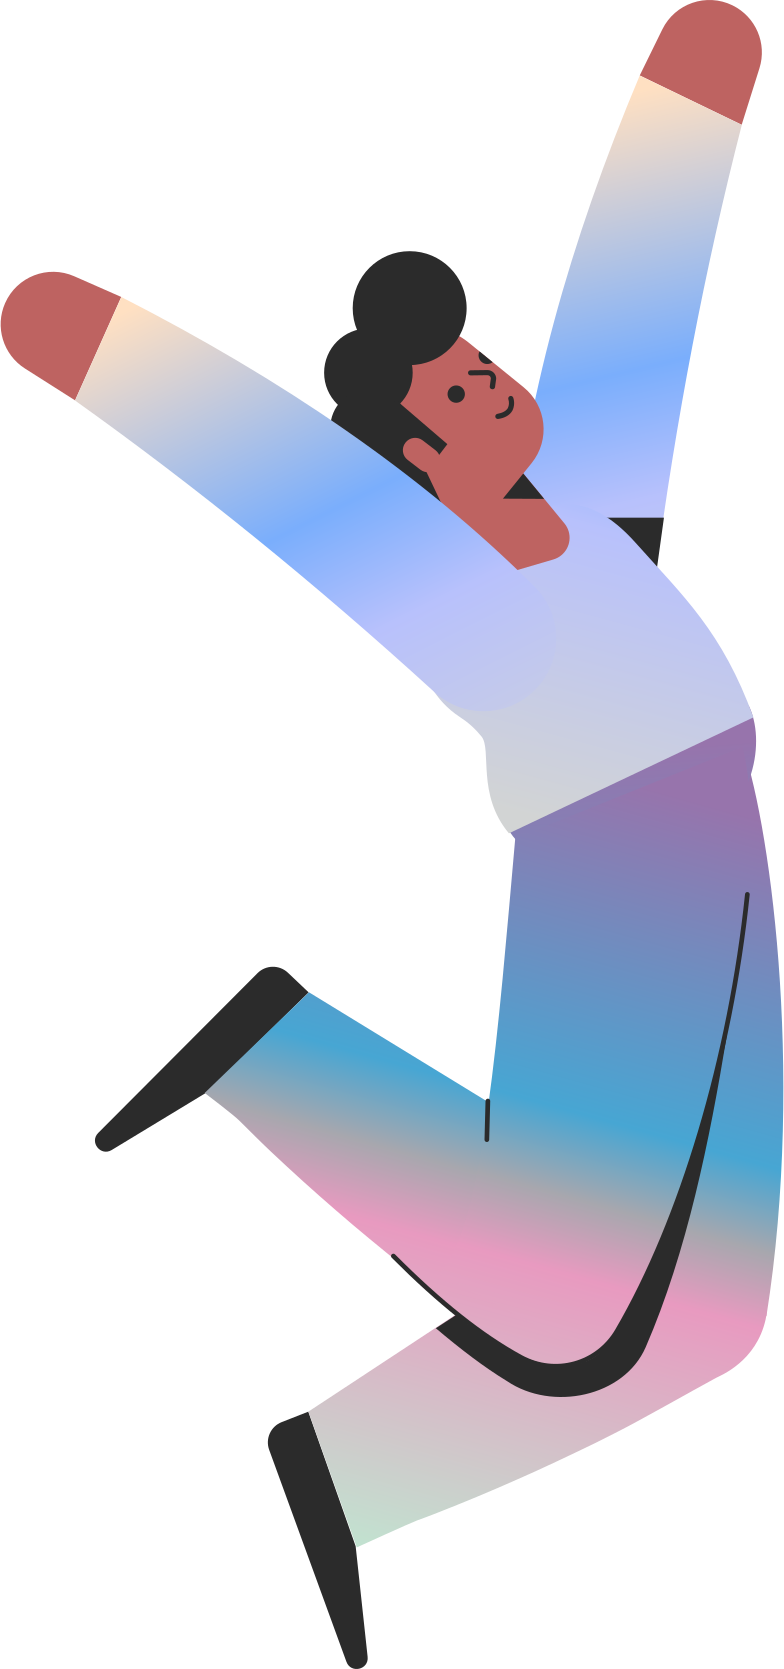 dancing man Clipart illustration in PNG, SVG